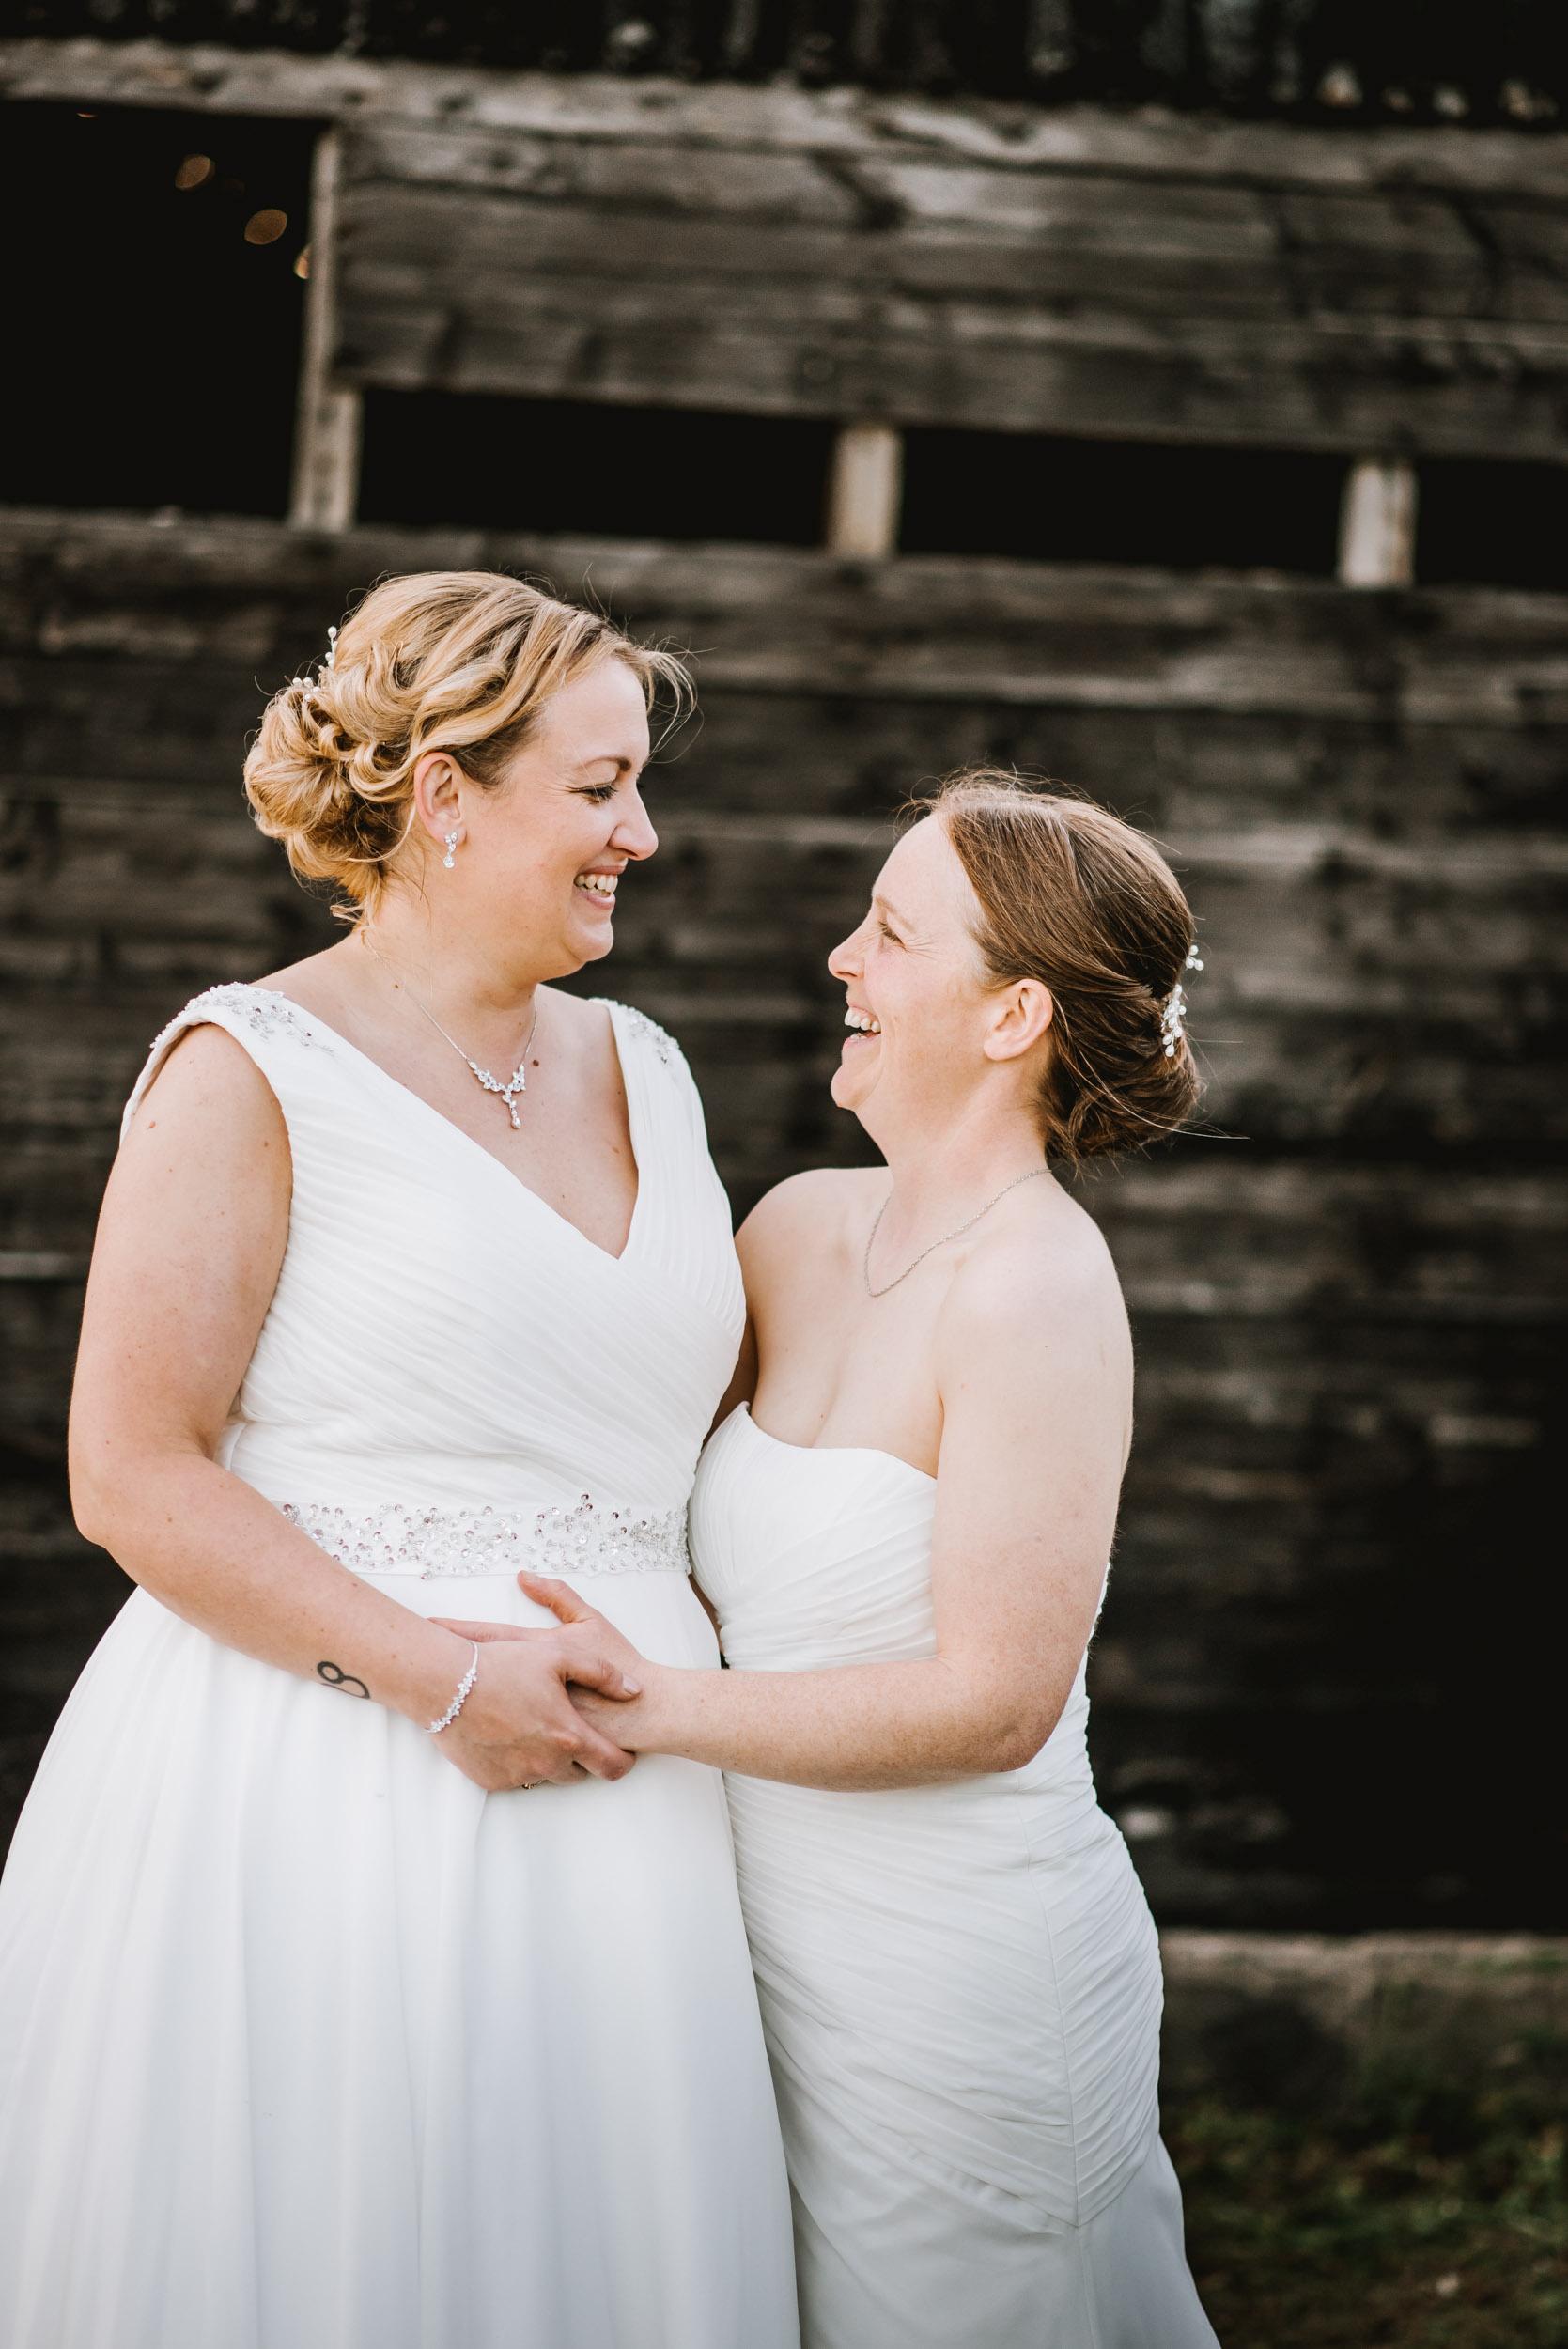 Donington-park-farm-wedding-photography-652.jpg